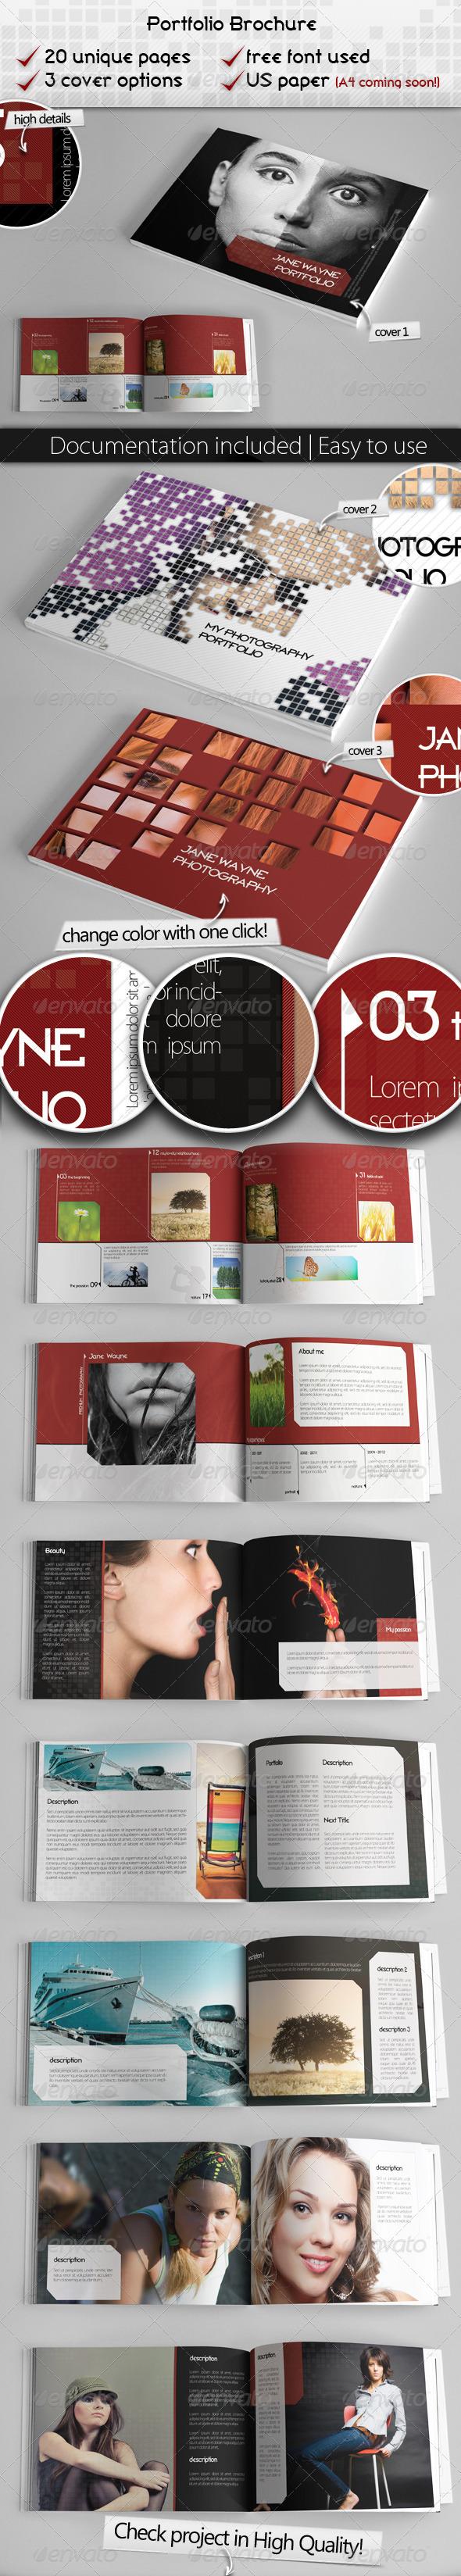 Portfolio Brochure Project - Portfolio Brochures